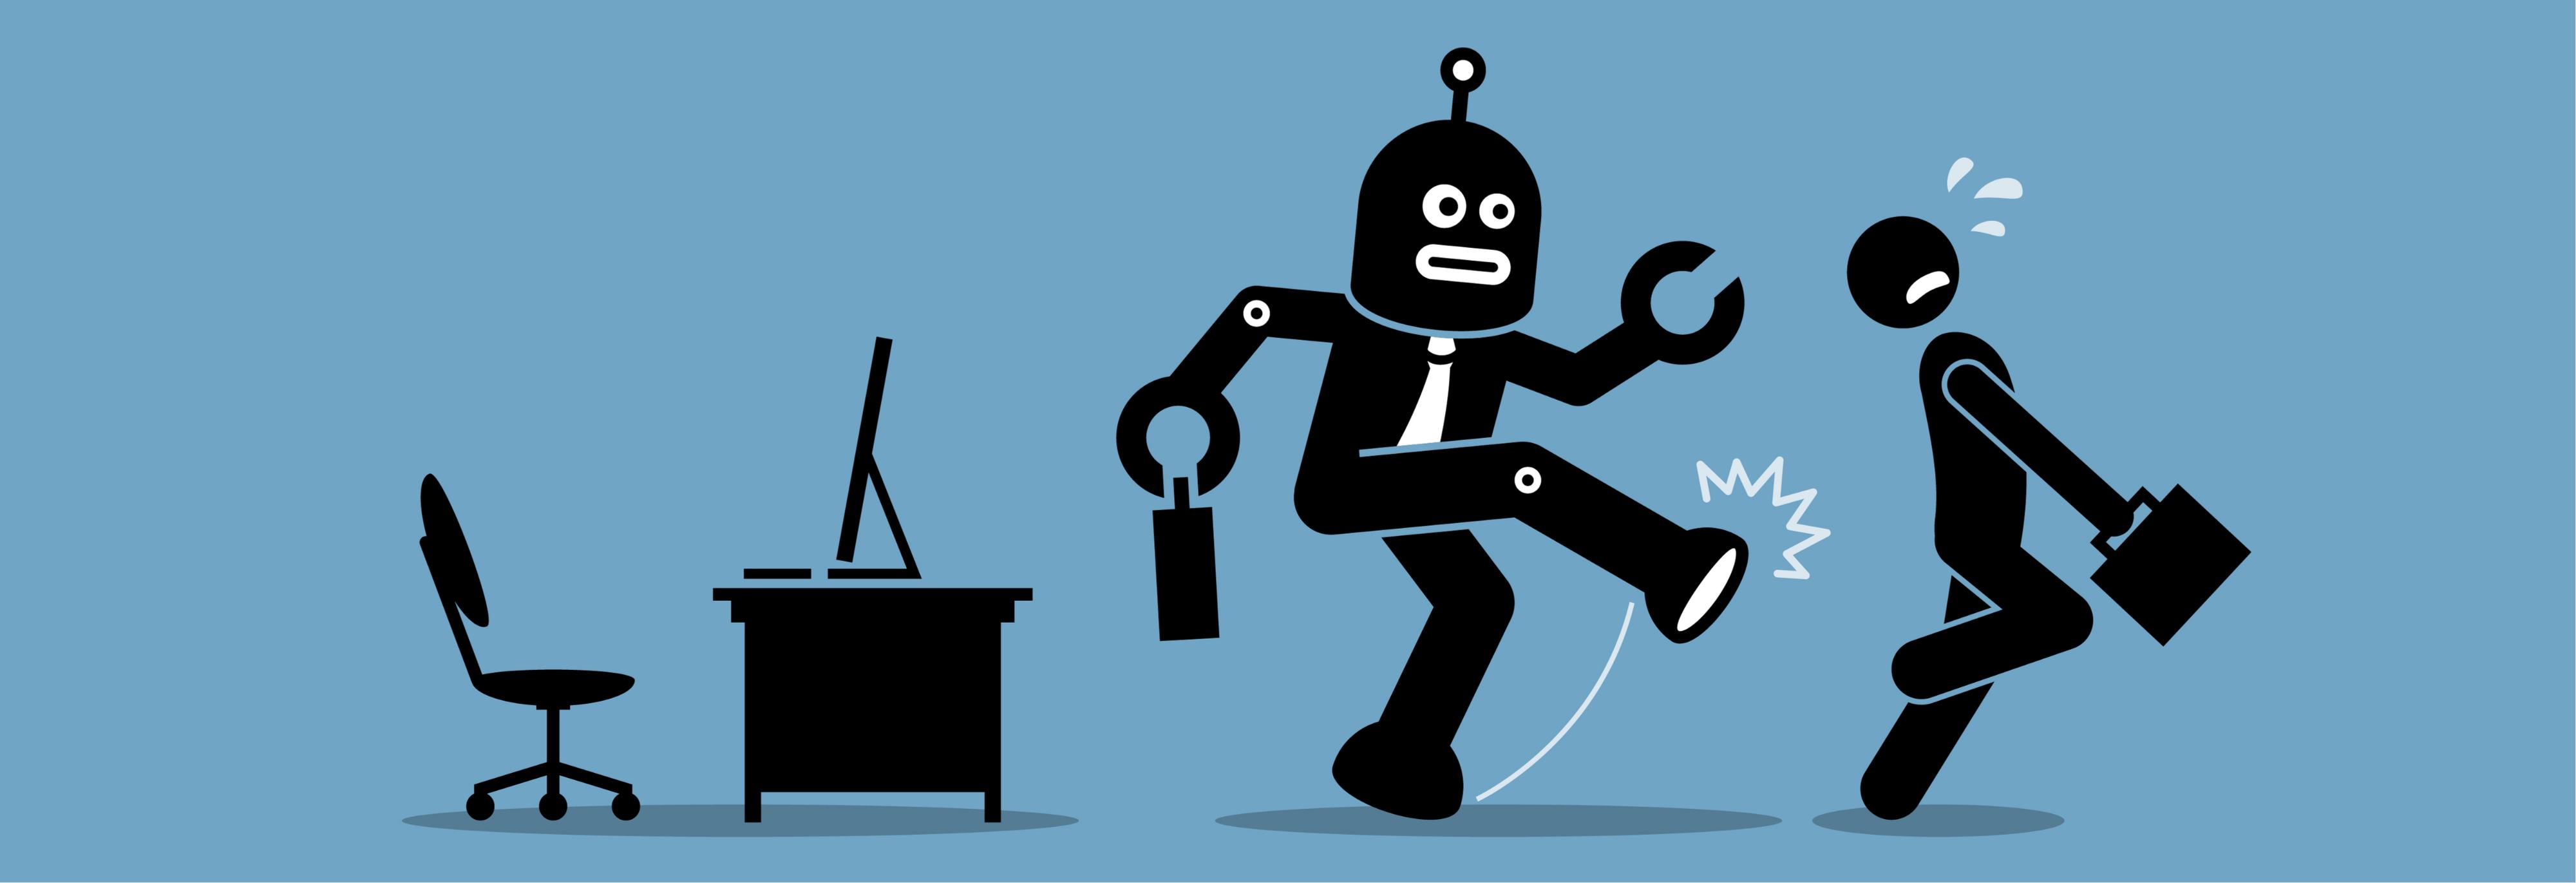 Humans clipart normal human. Ai robots do not